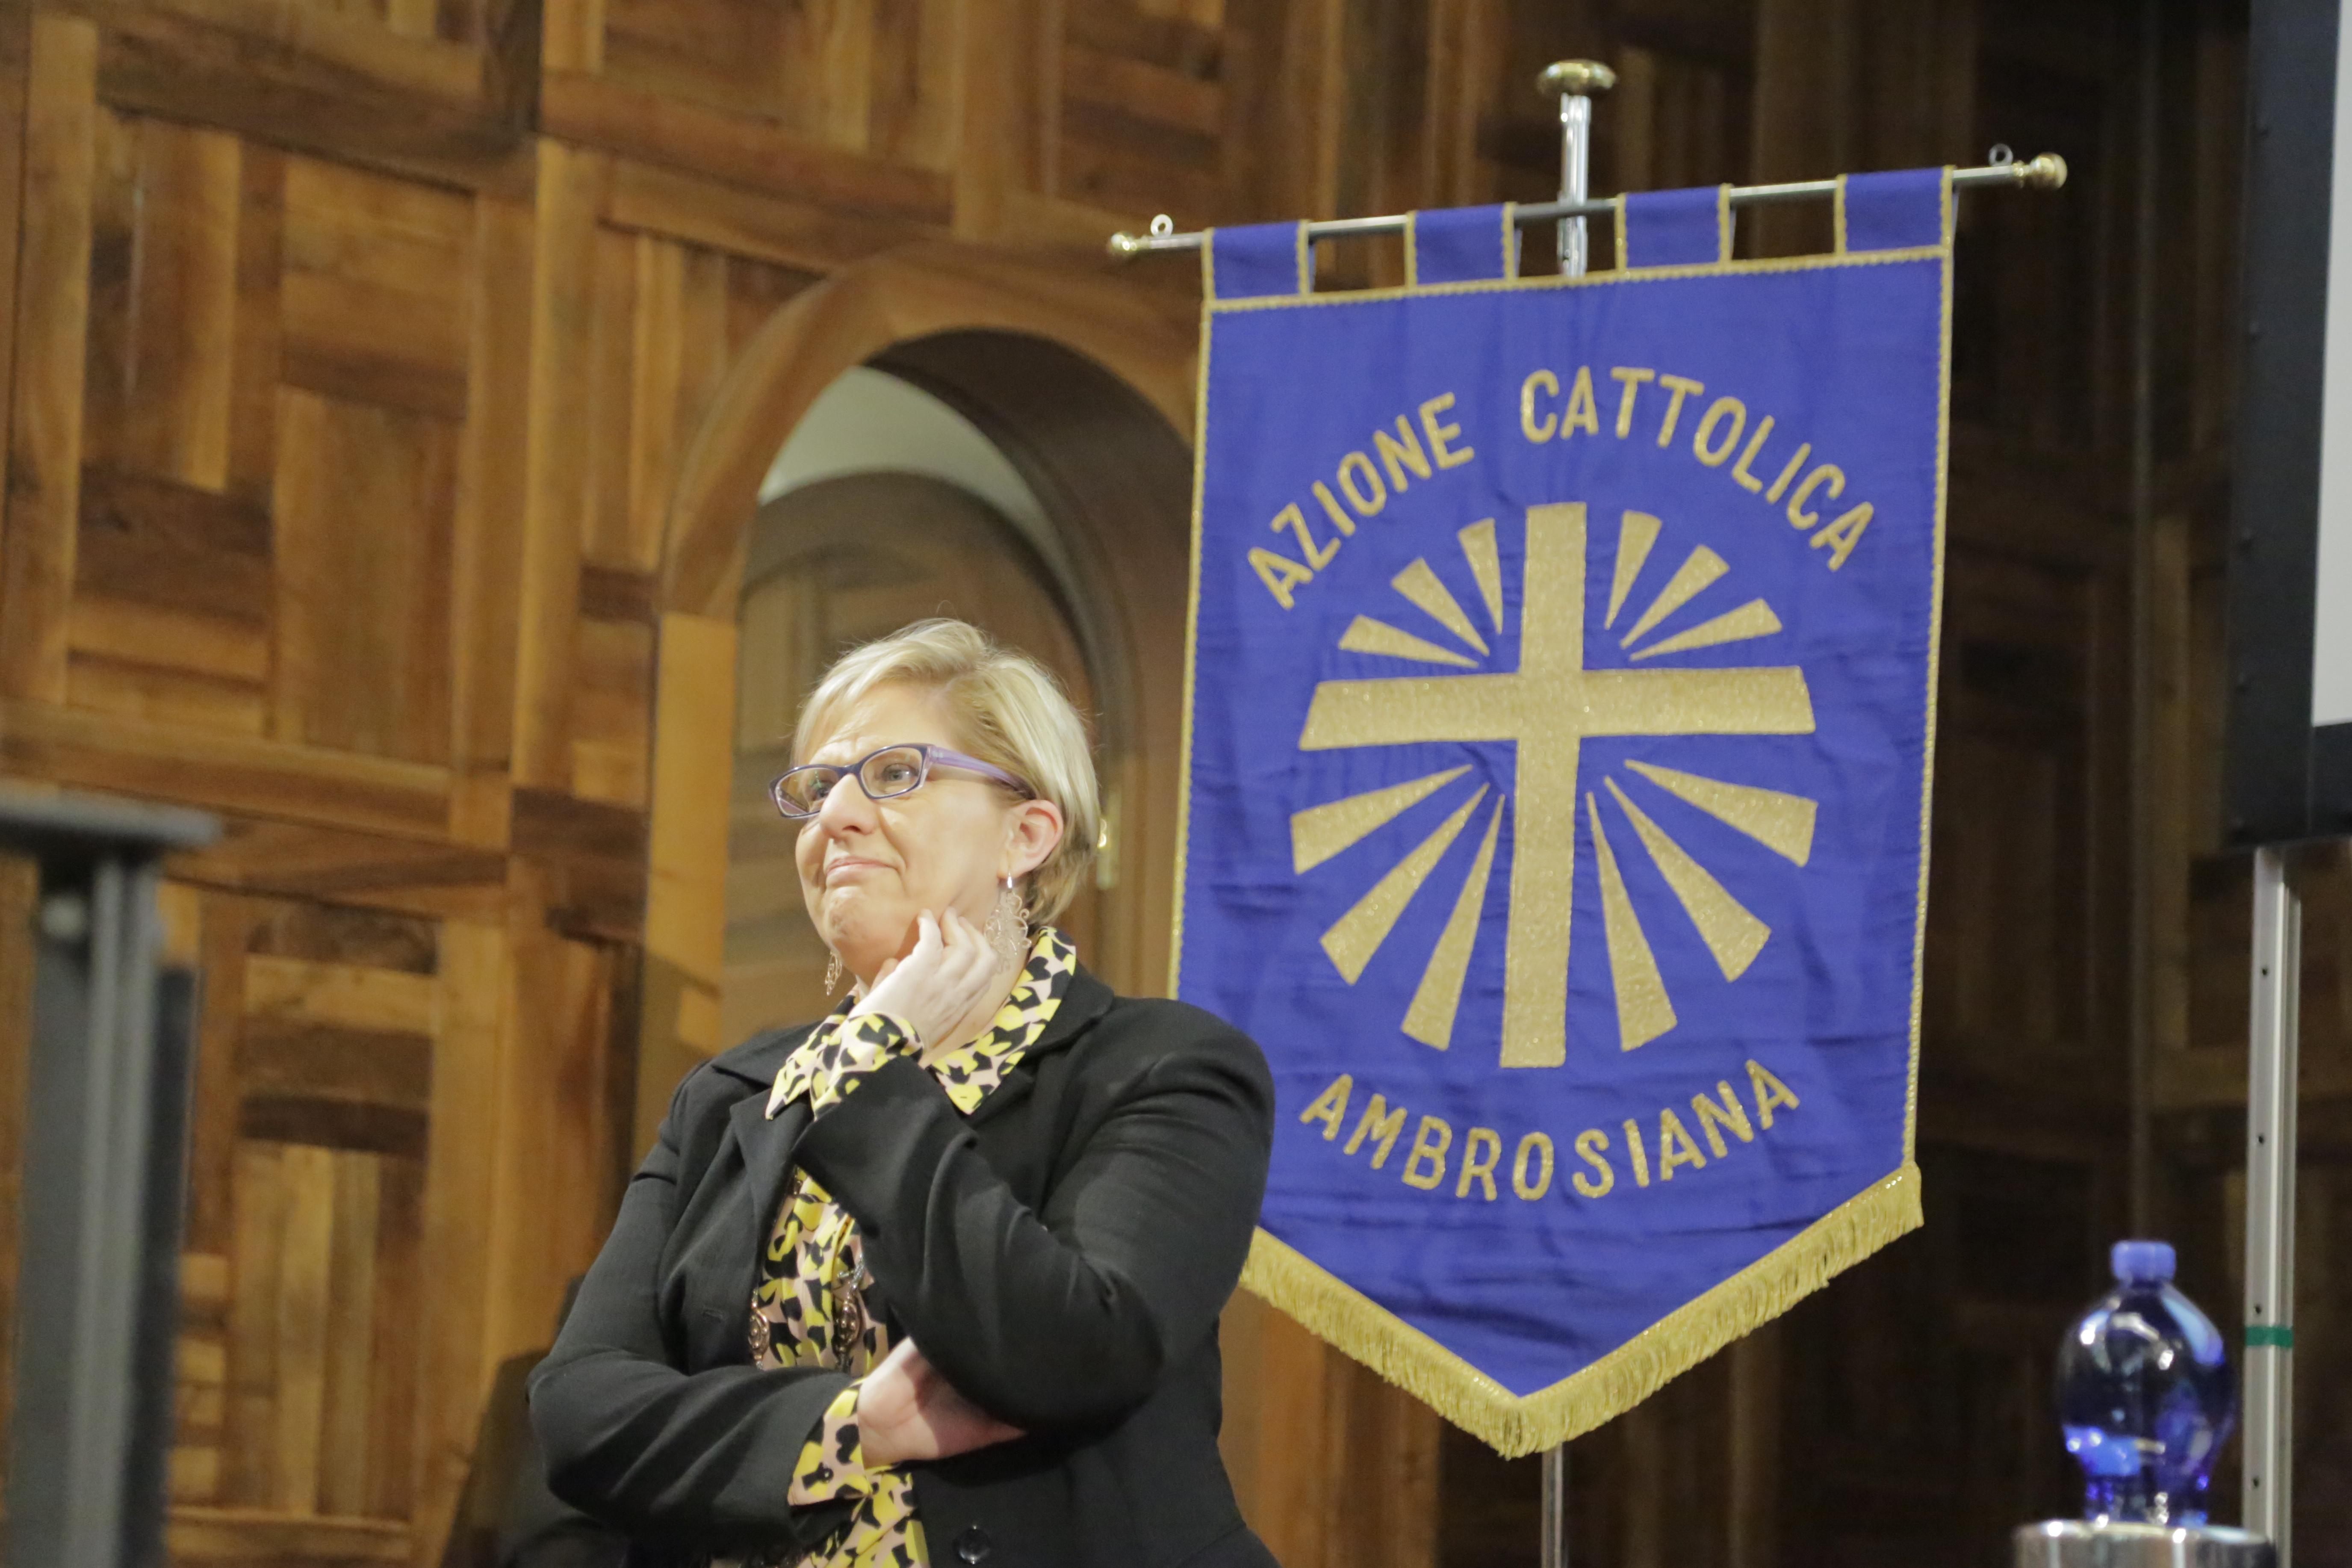 Silvia Landra bandiera Ac assemblea Cropped